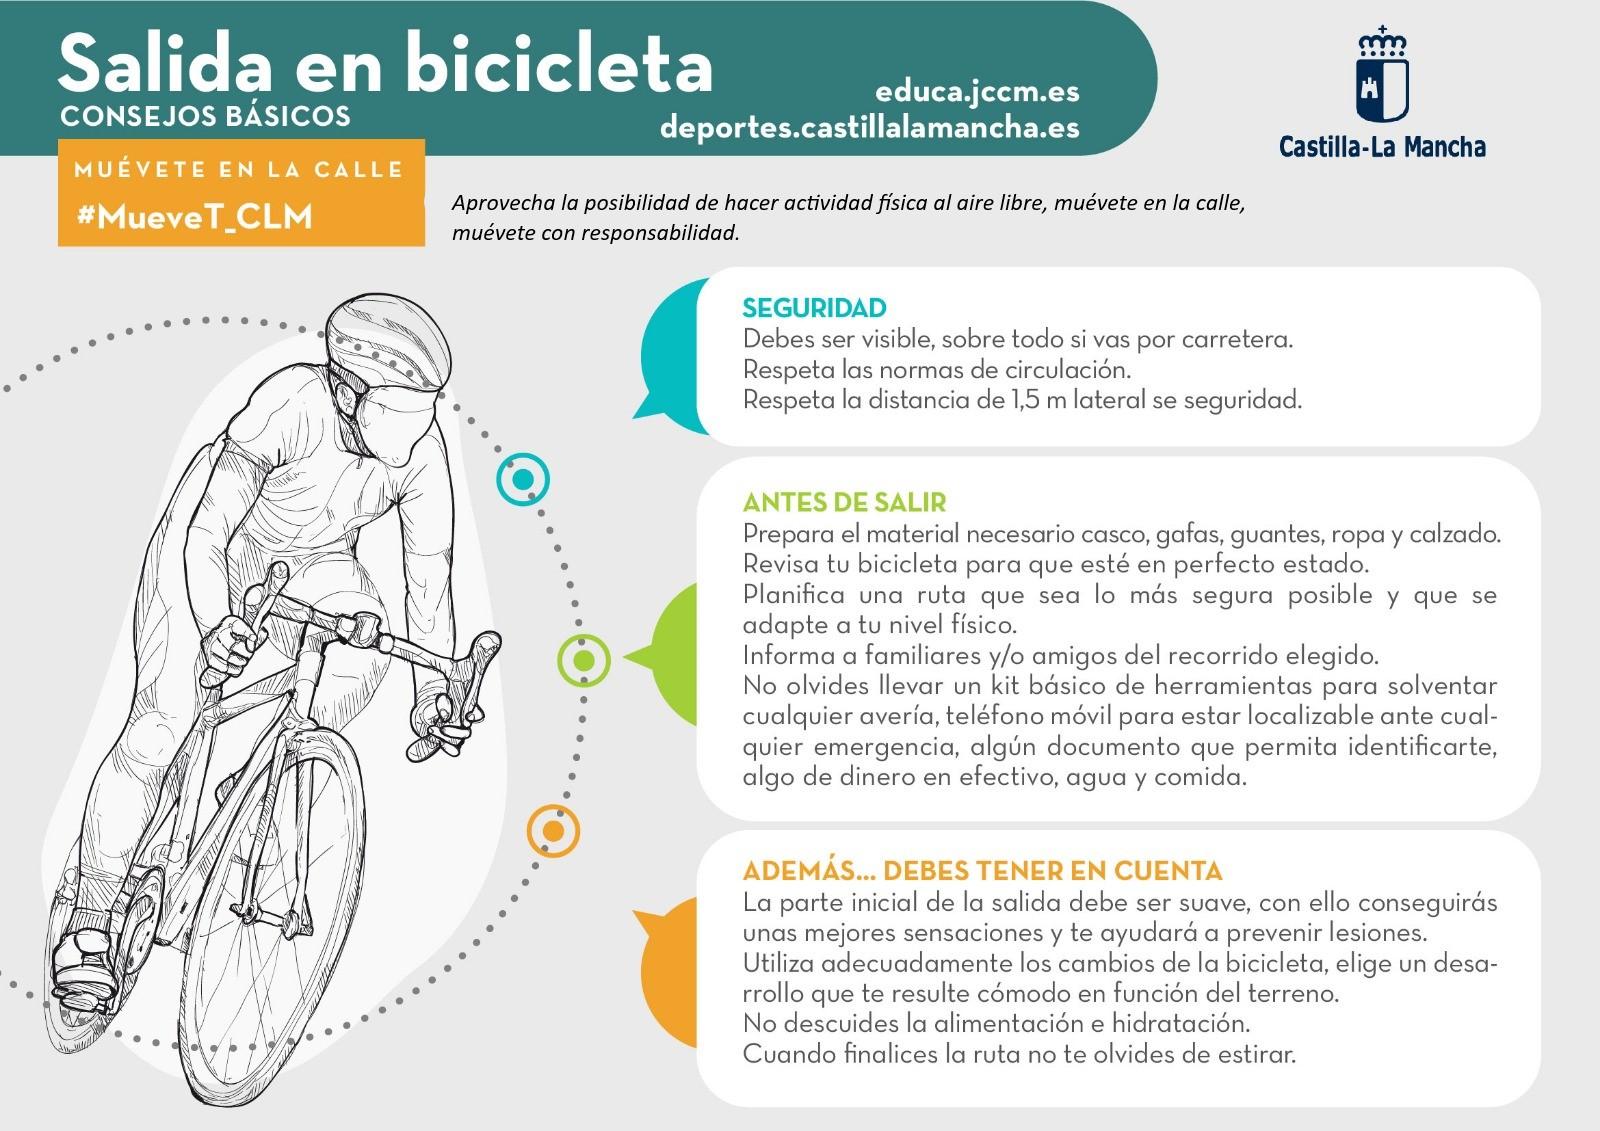 Salida en bicicleta